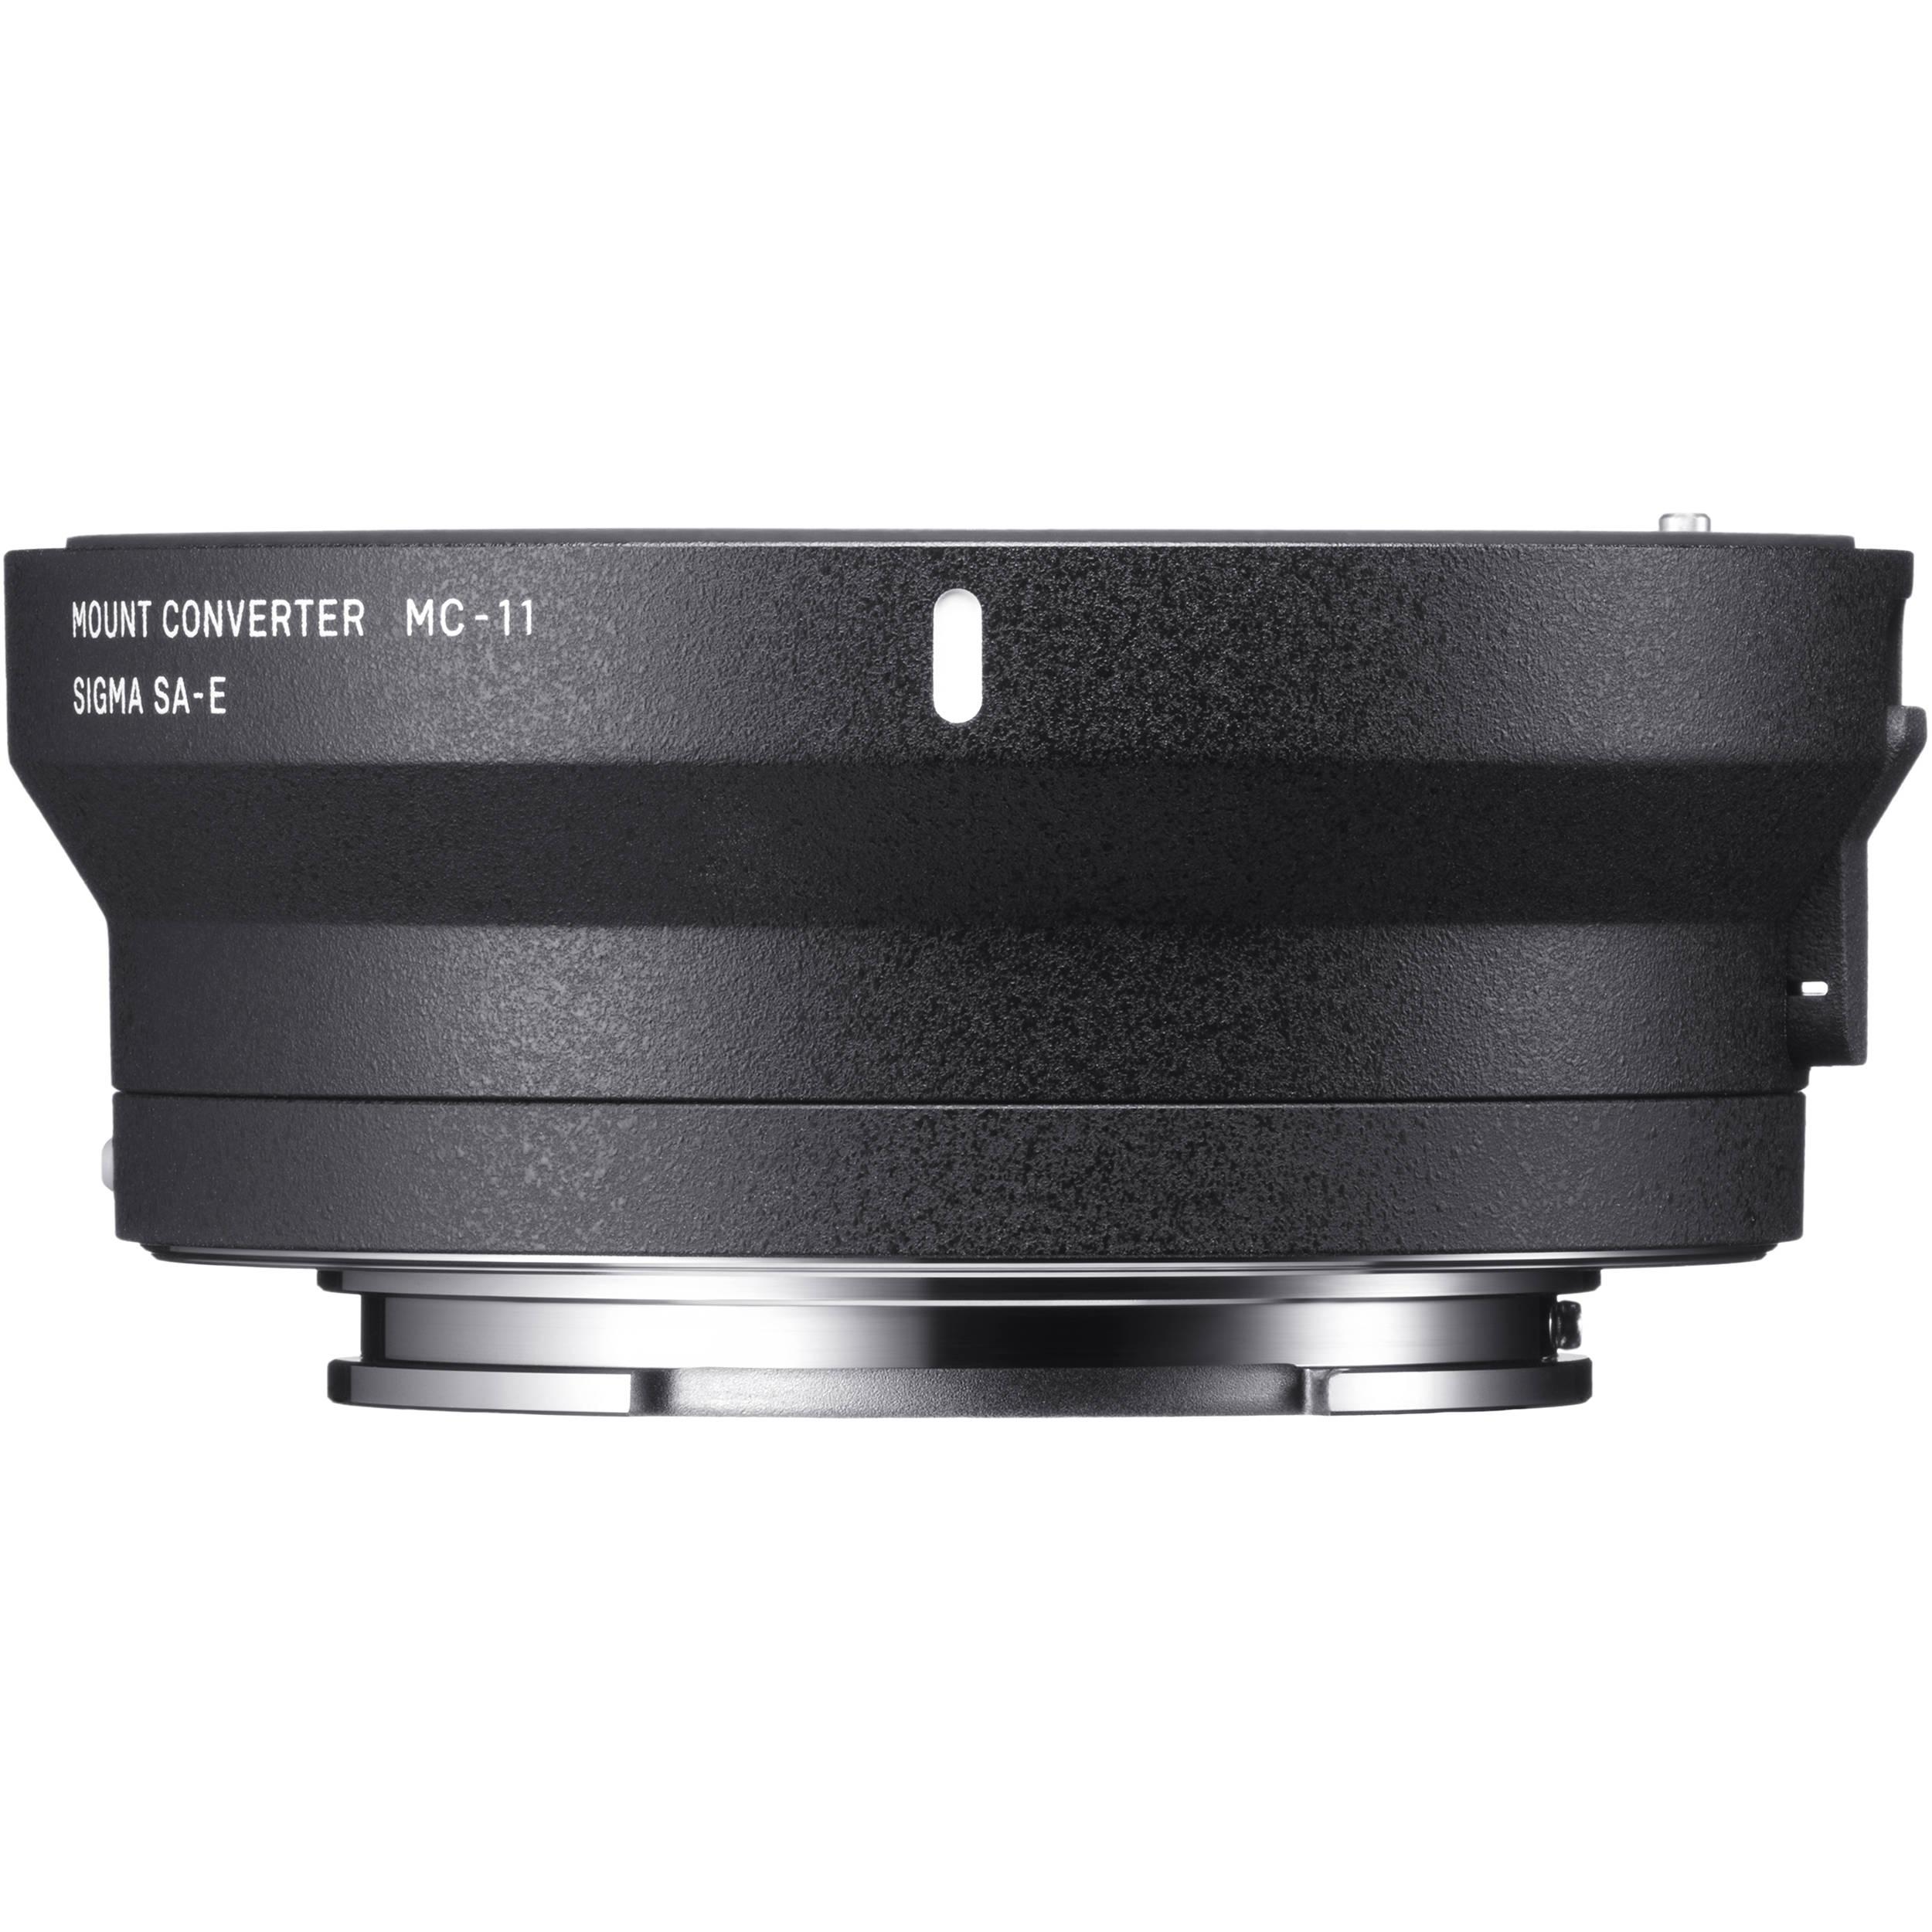 Sigma Mount Converter MC-11 SA-EMount